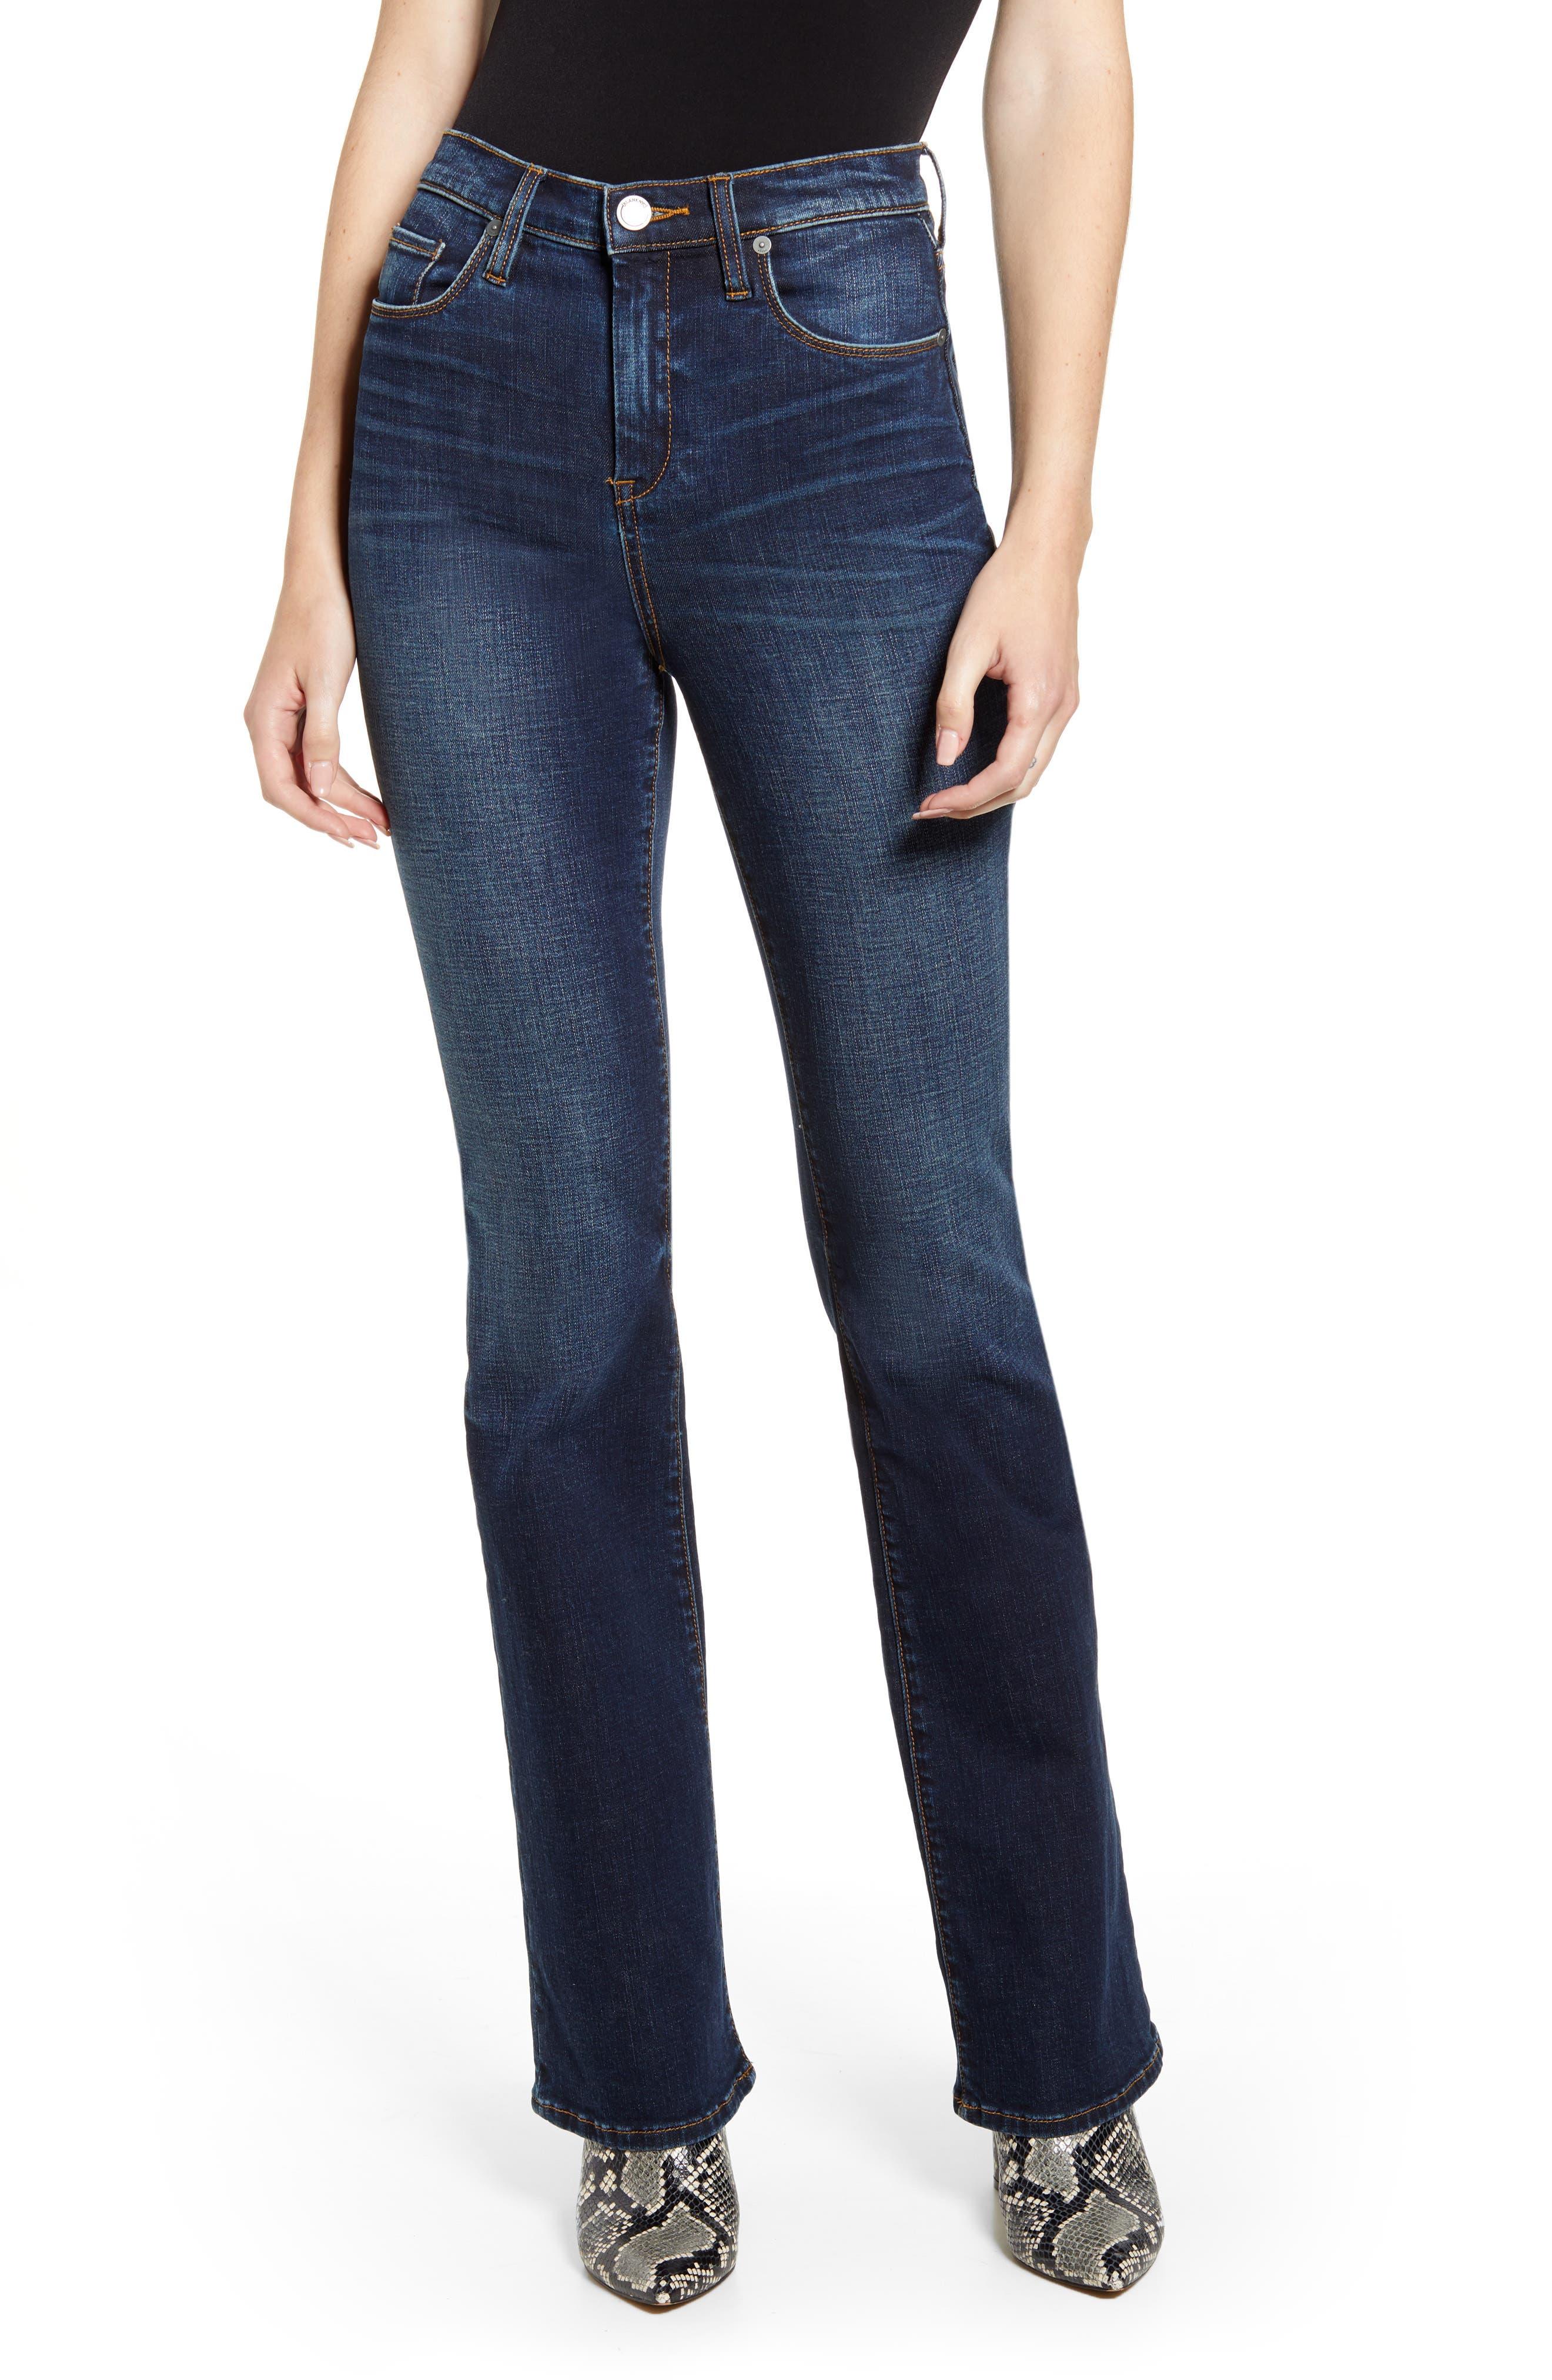 BLANKNYC High Waist Flare Jeans (Counterculture)